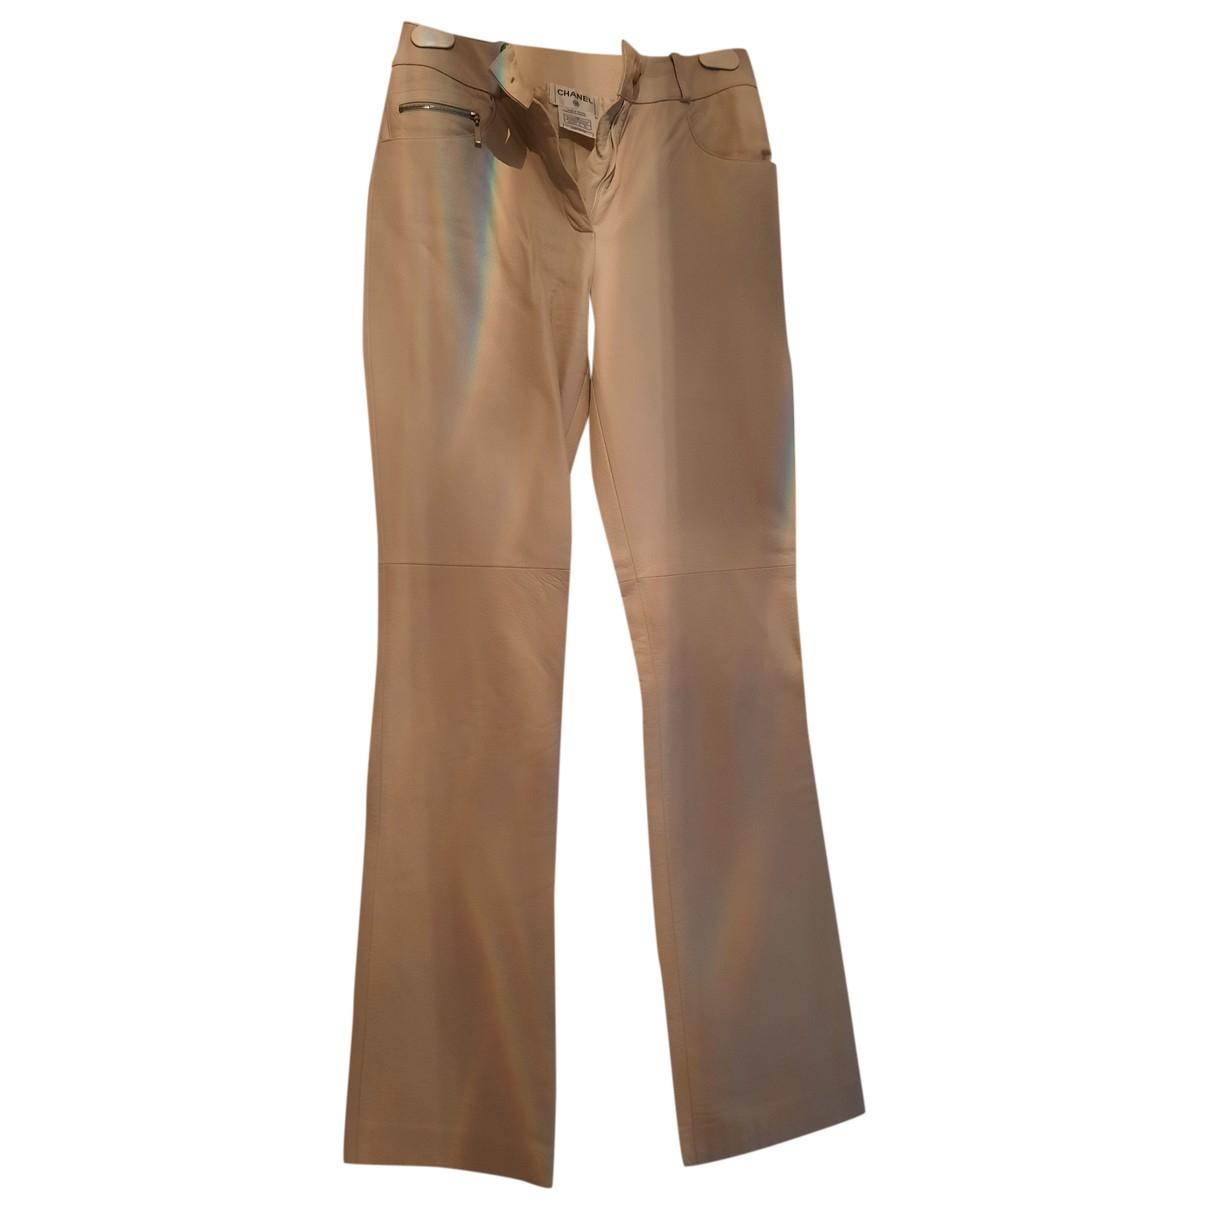 Chanel \N Ecru Leather Trousers for Women 36 FR